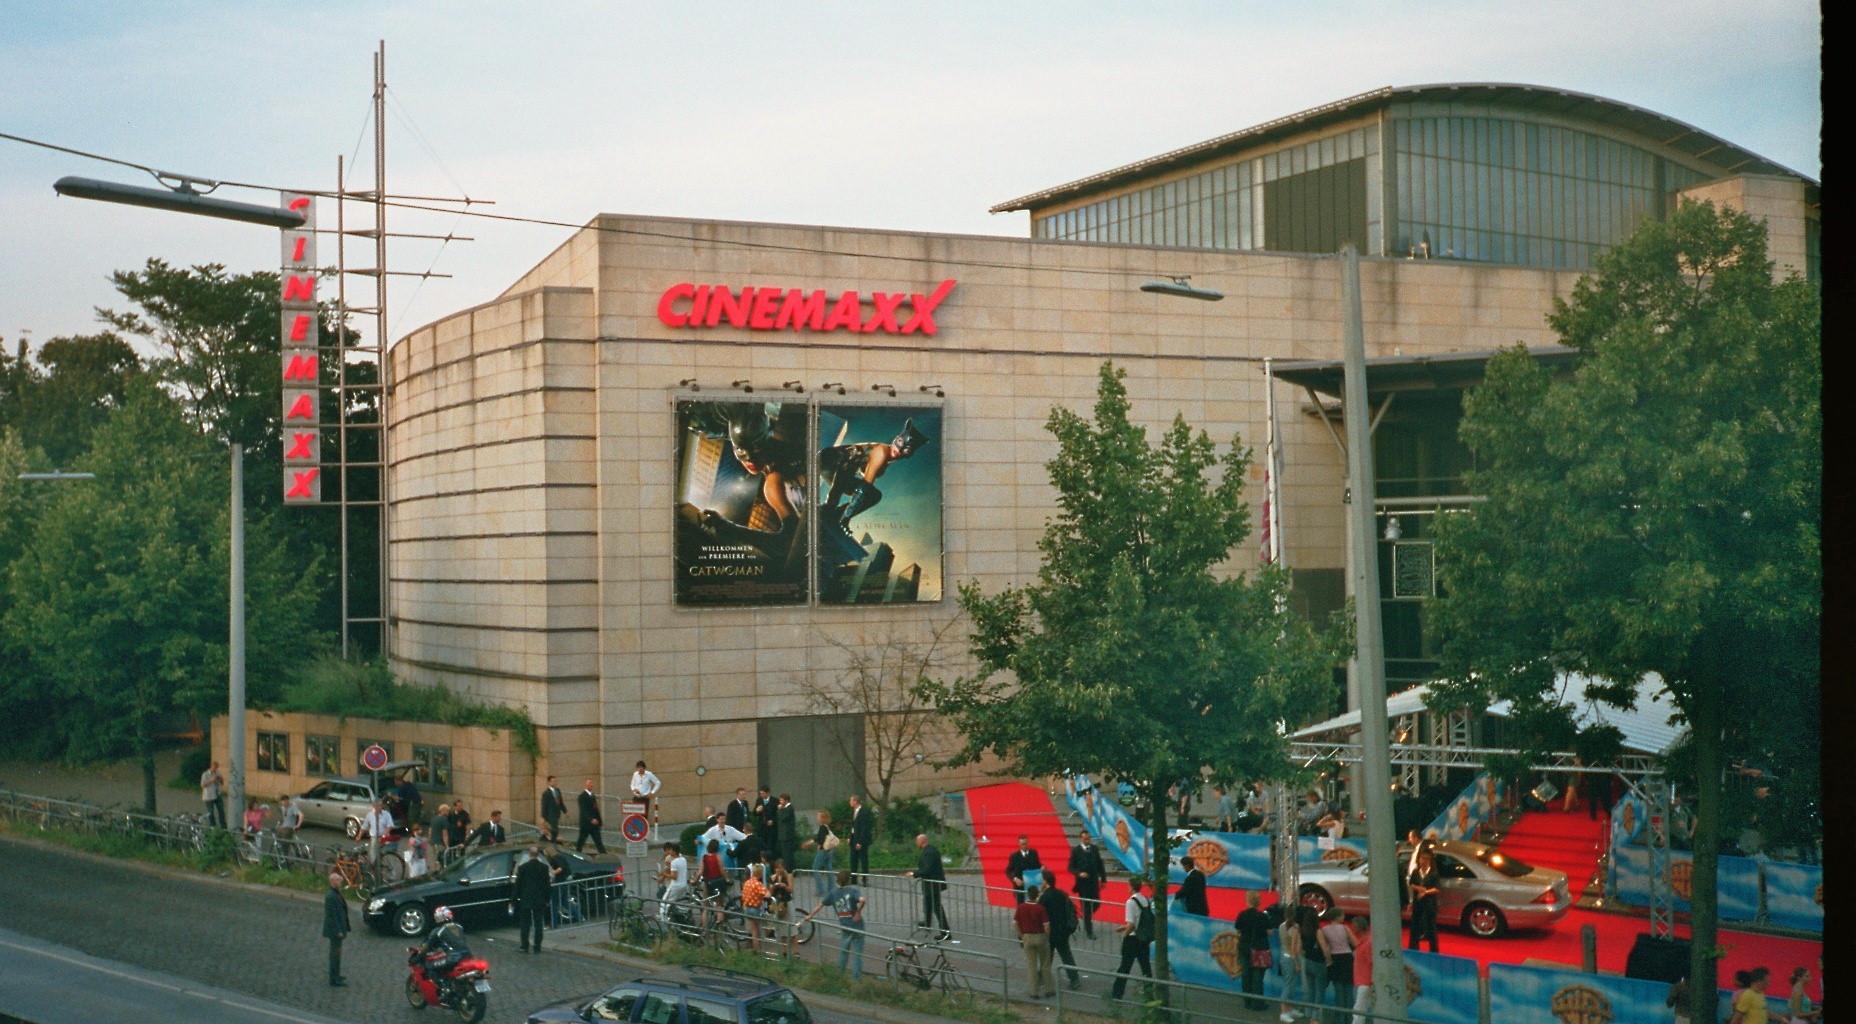 Cinemaxx Hamburg-Dammtor Hamburg